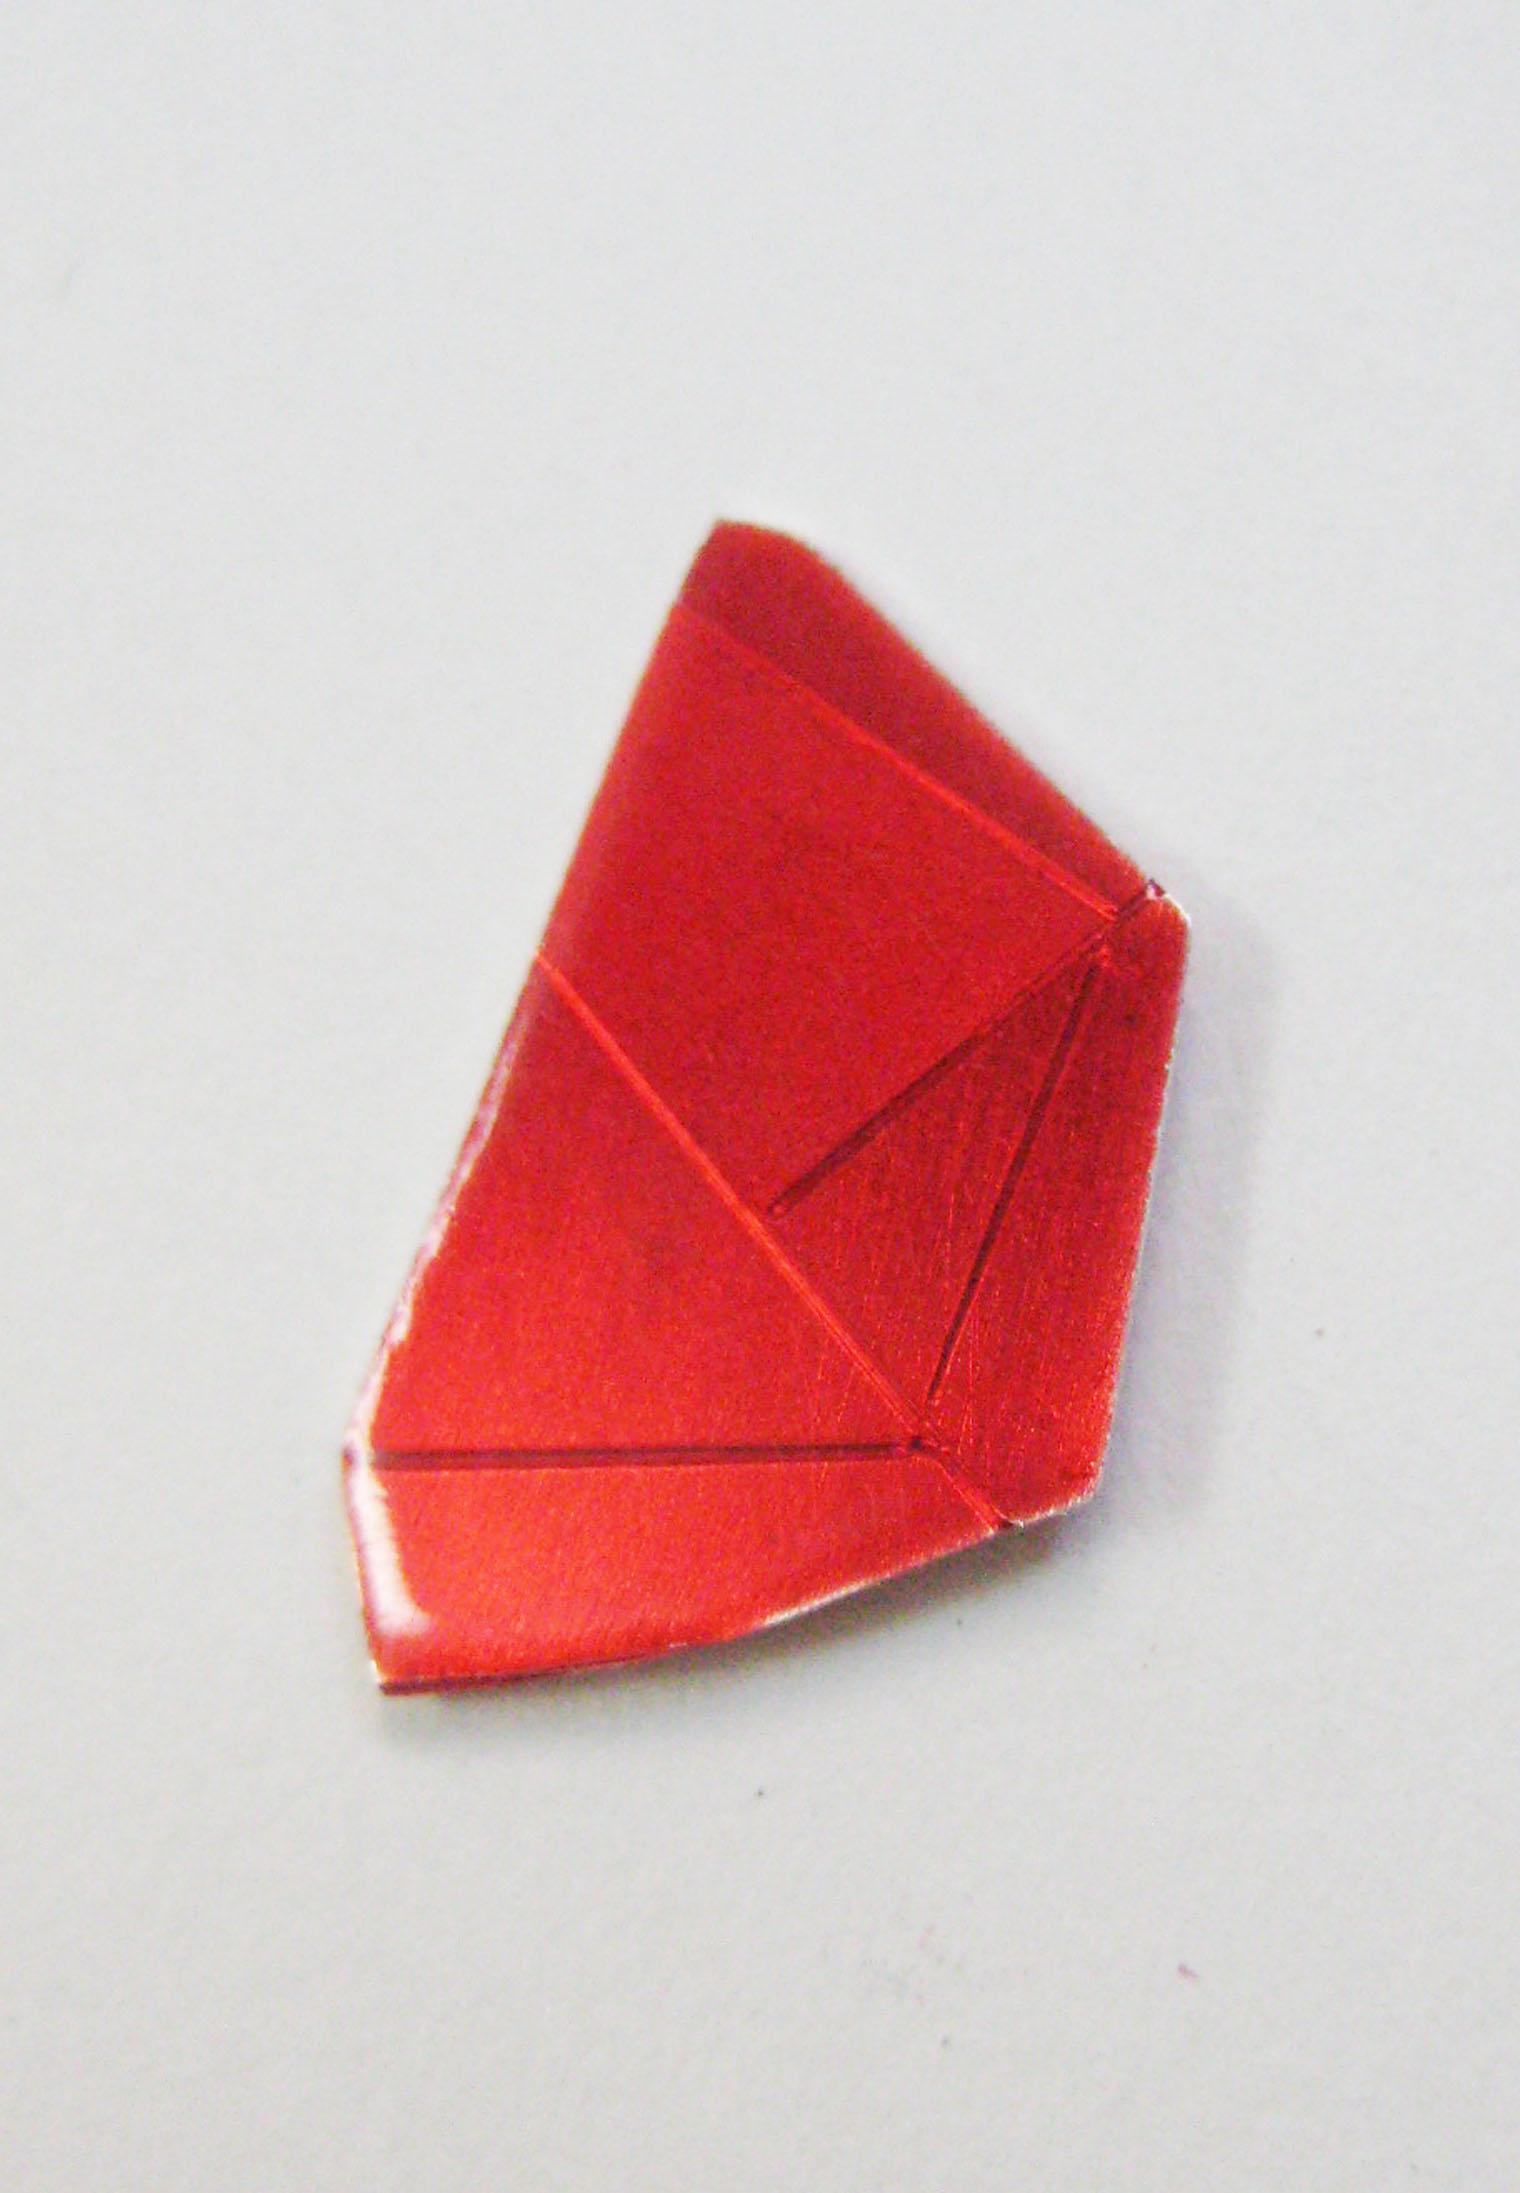 14-Single Red Pin Gem-Voegele.jpg